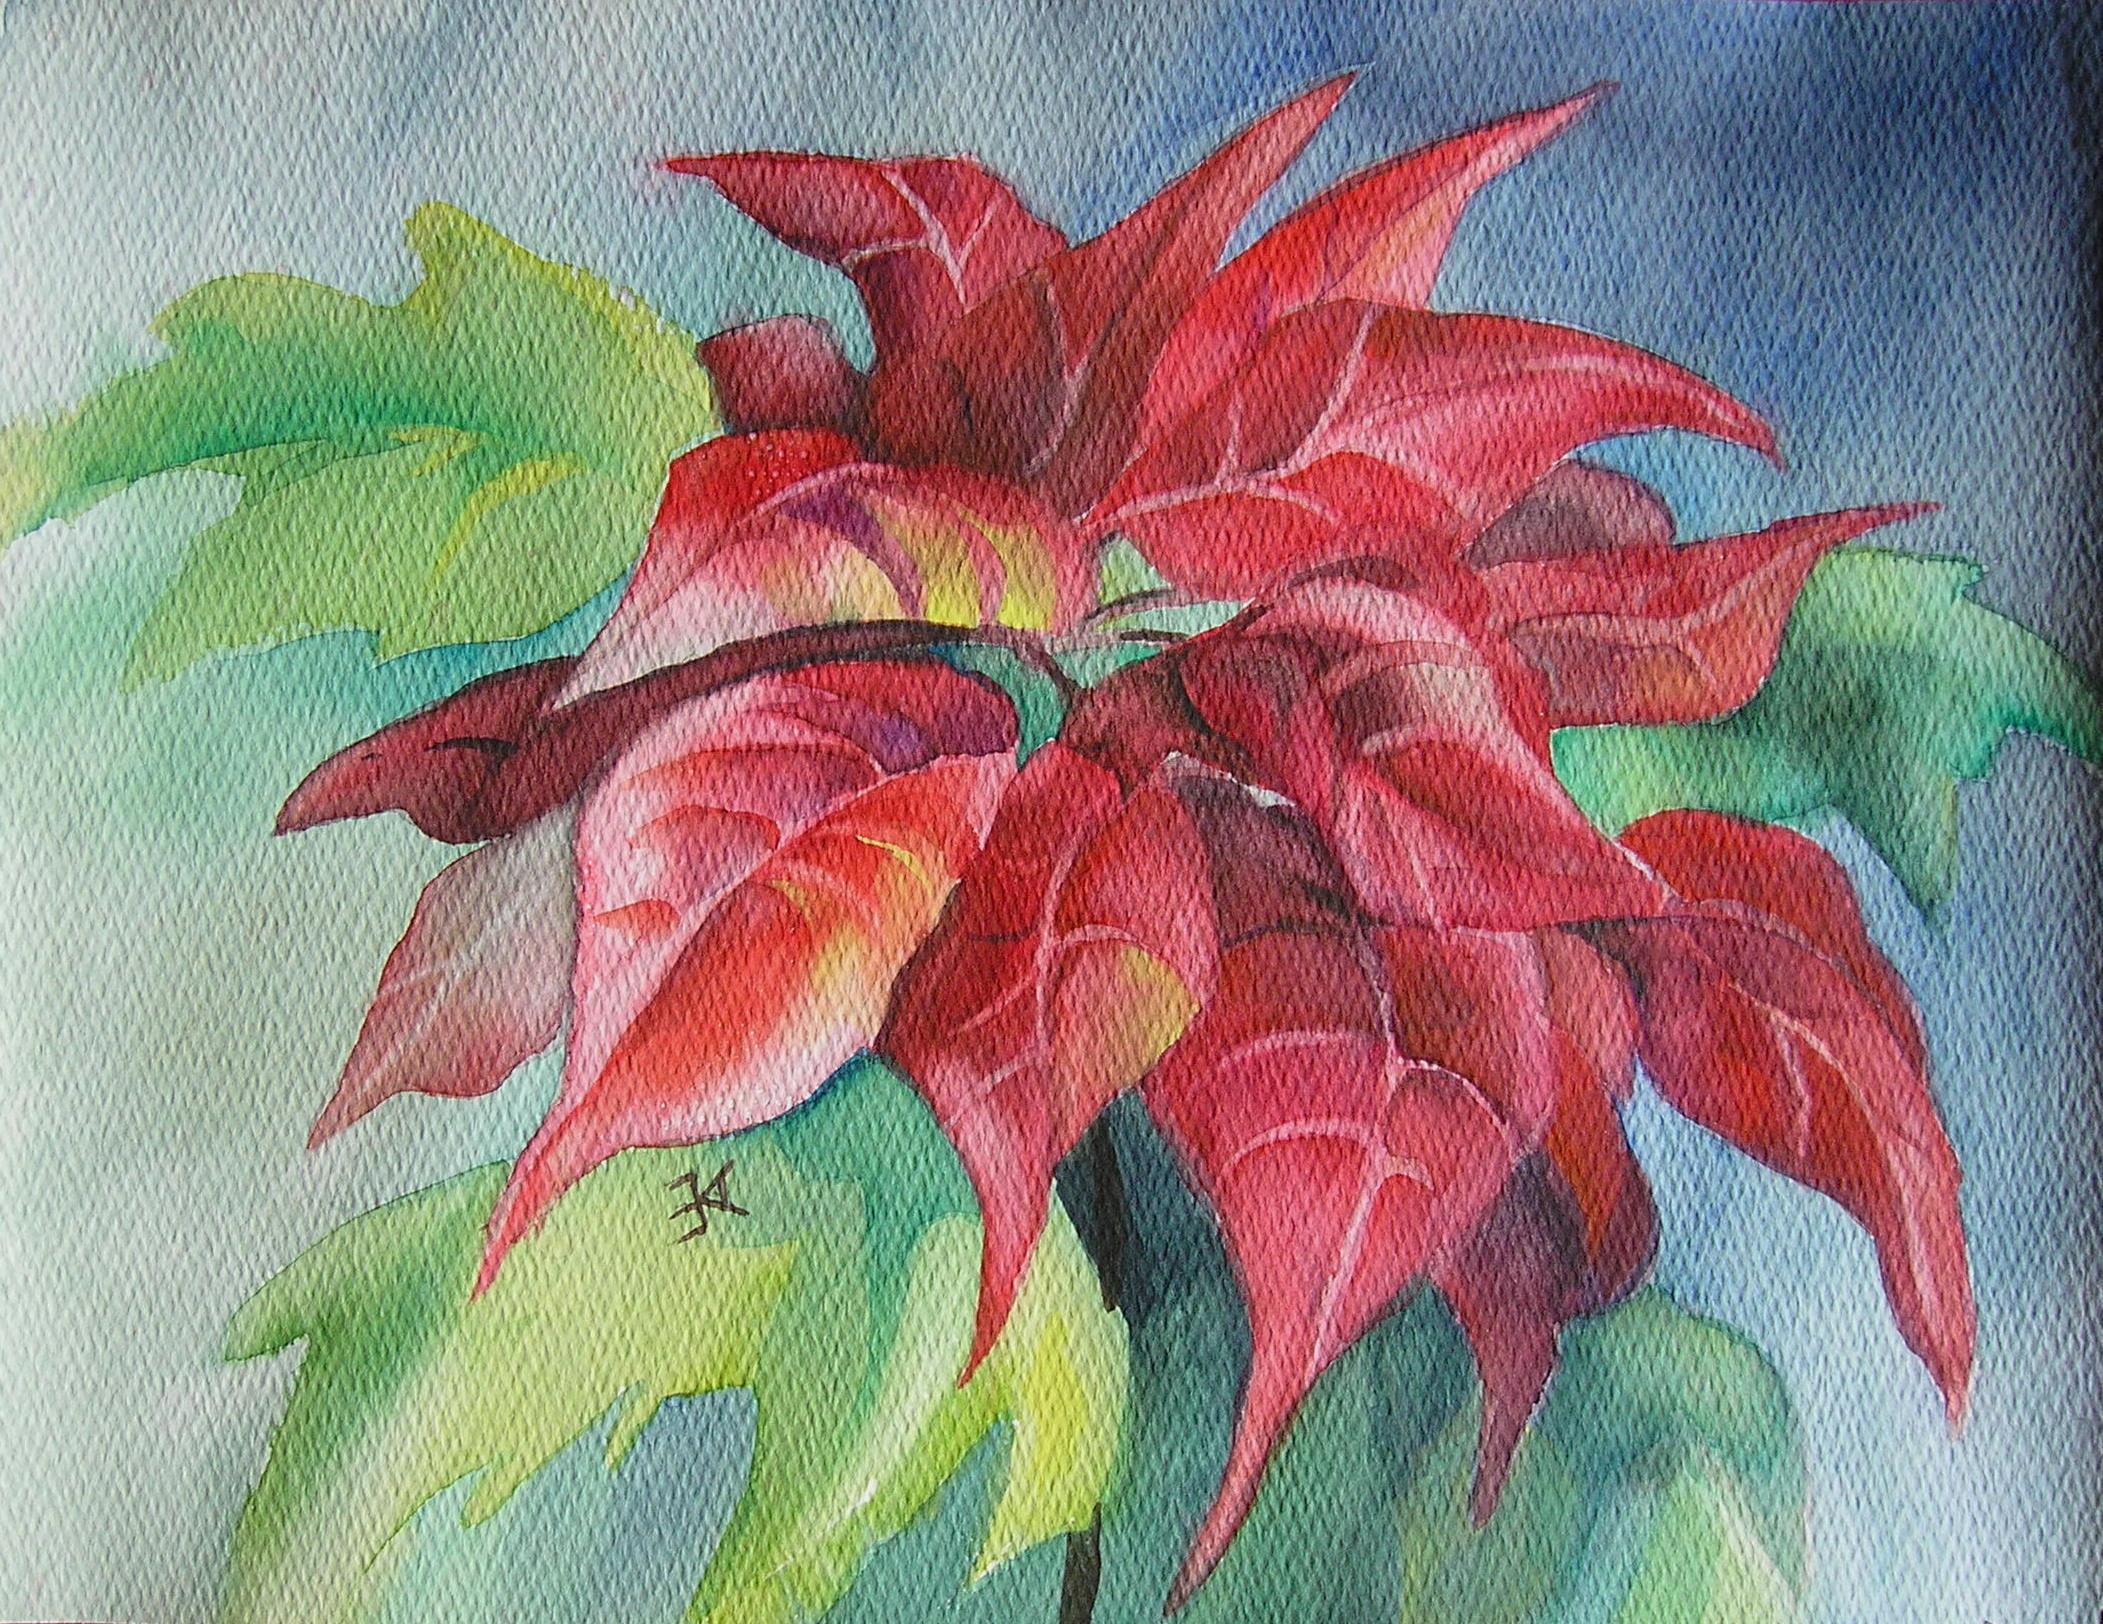 Poinsettia painting